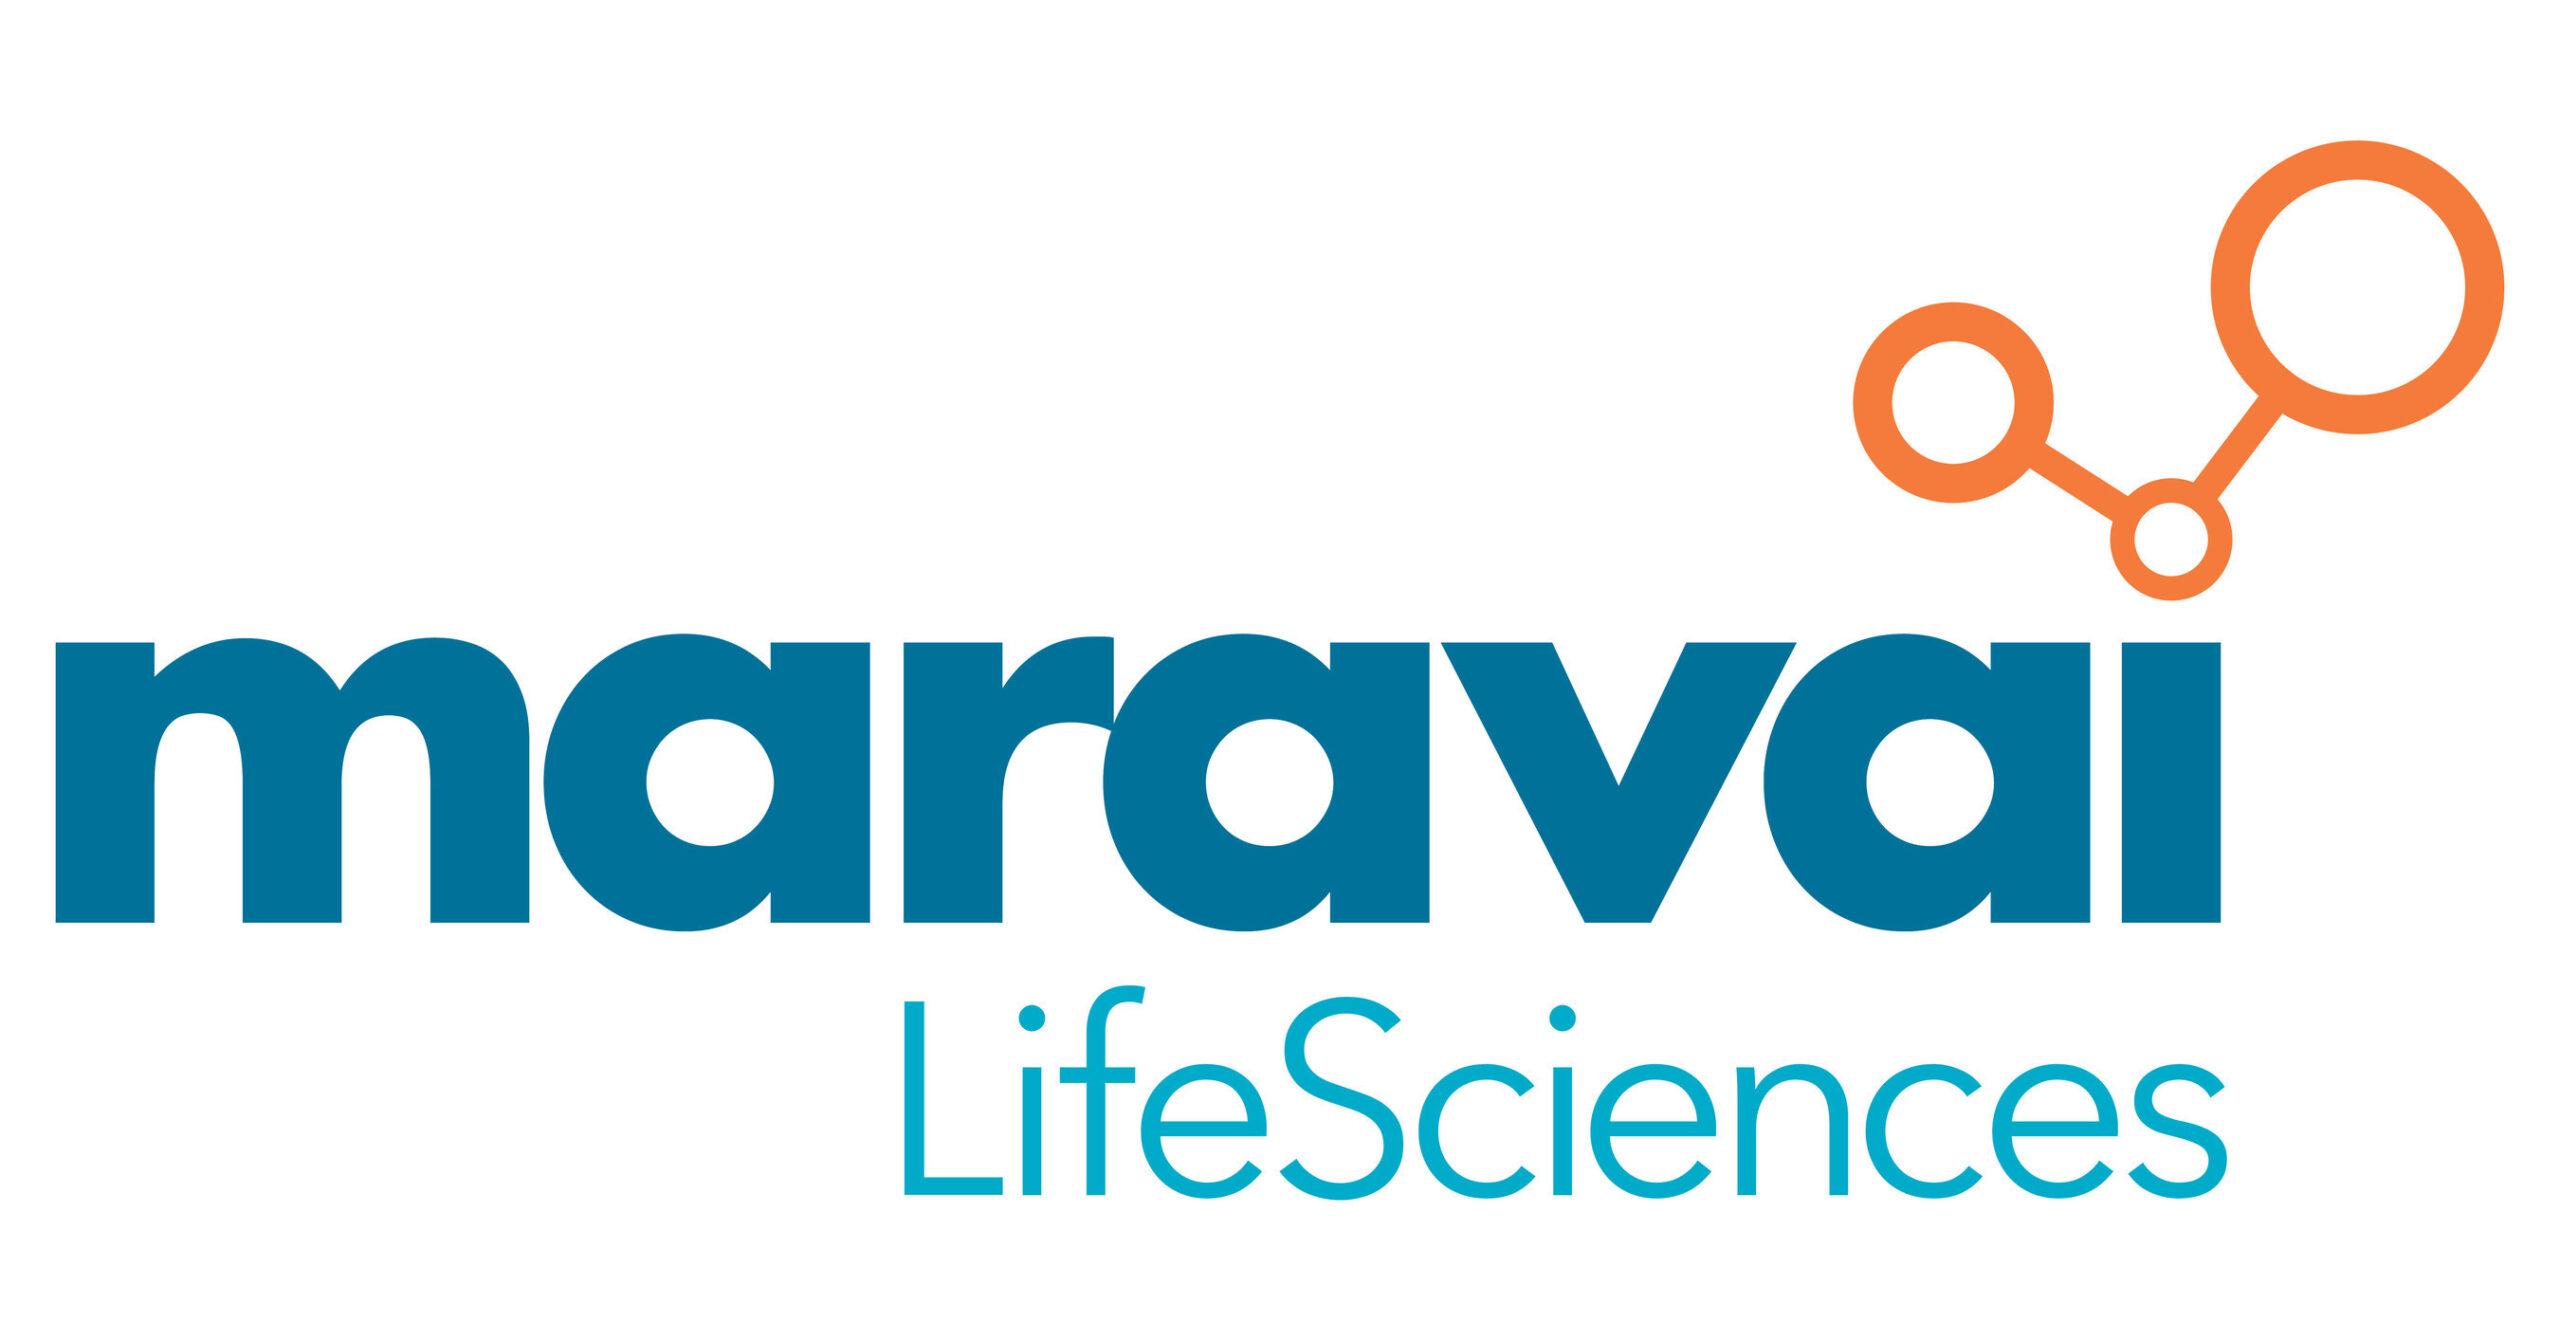 Maravai LifeSciences IPO